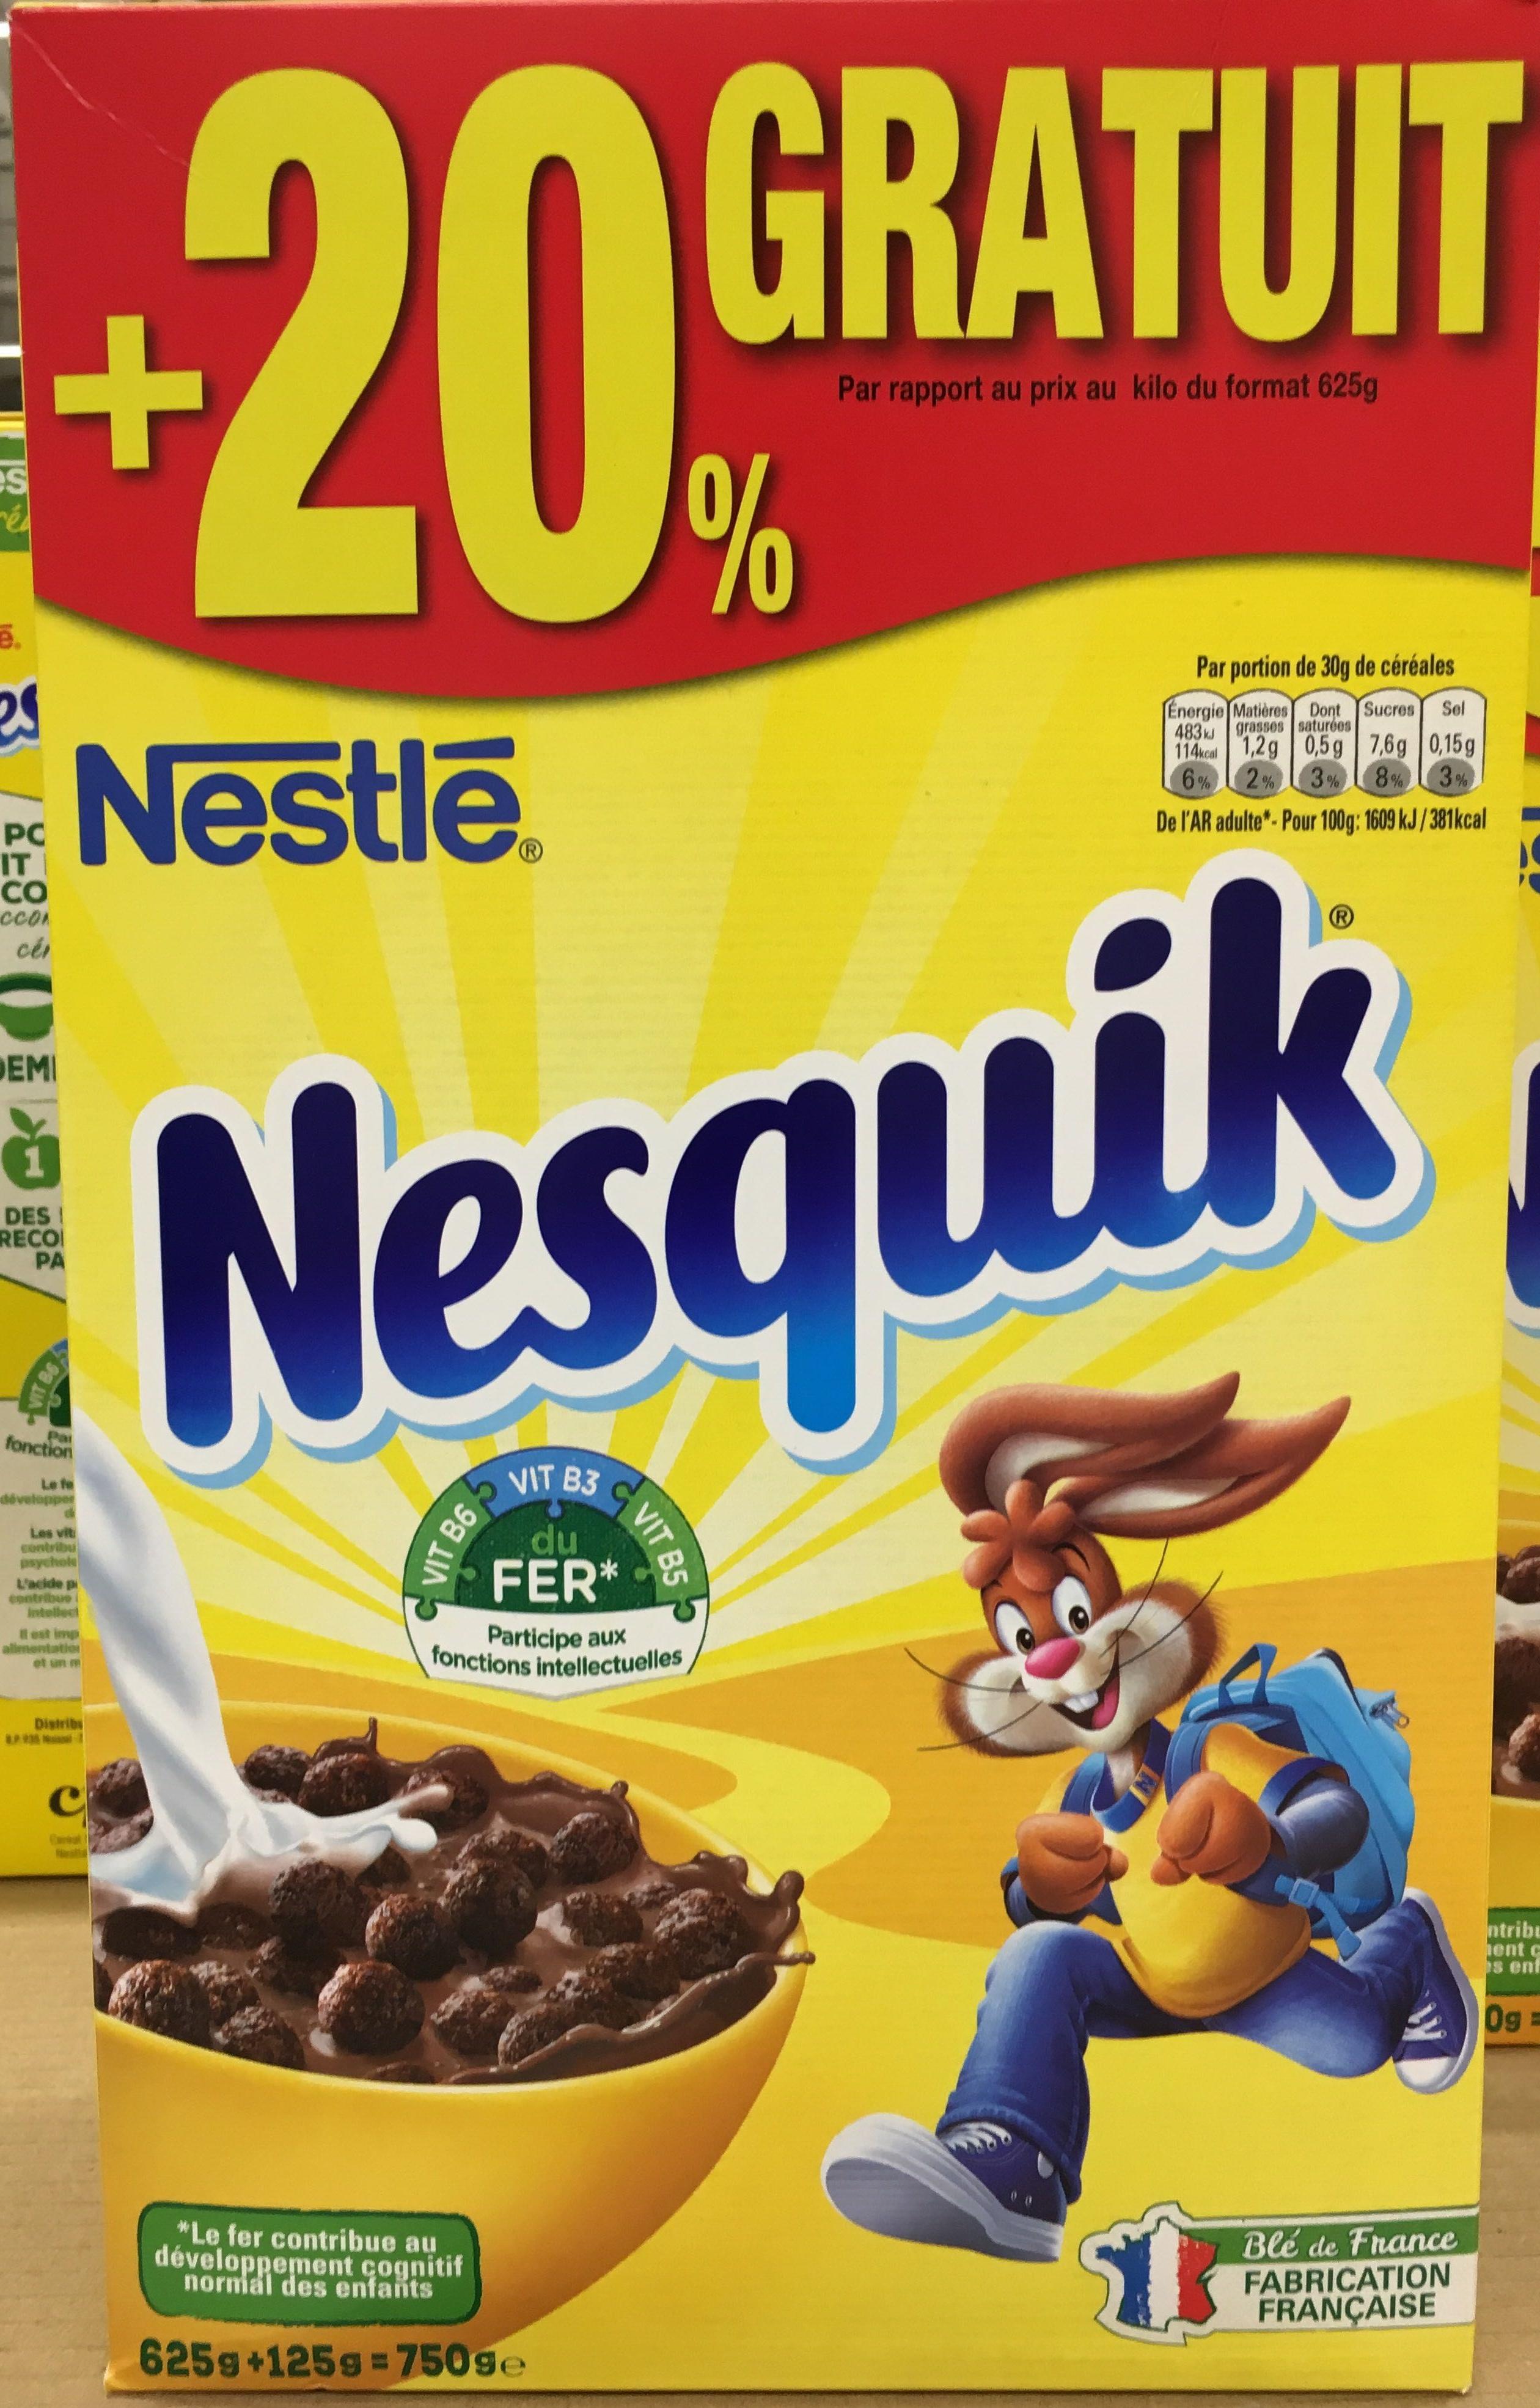 Nesquik 20 gratuit nestl 750 g for Produit cuisine